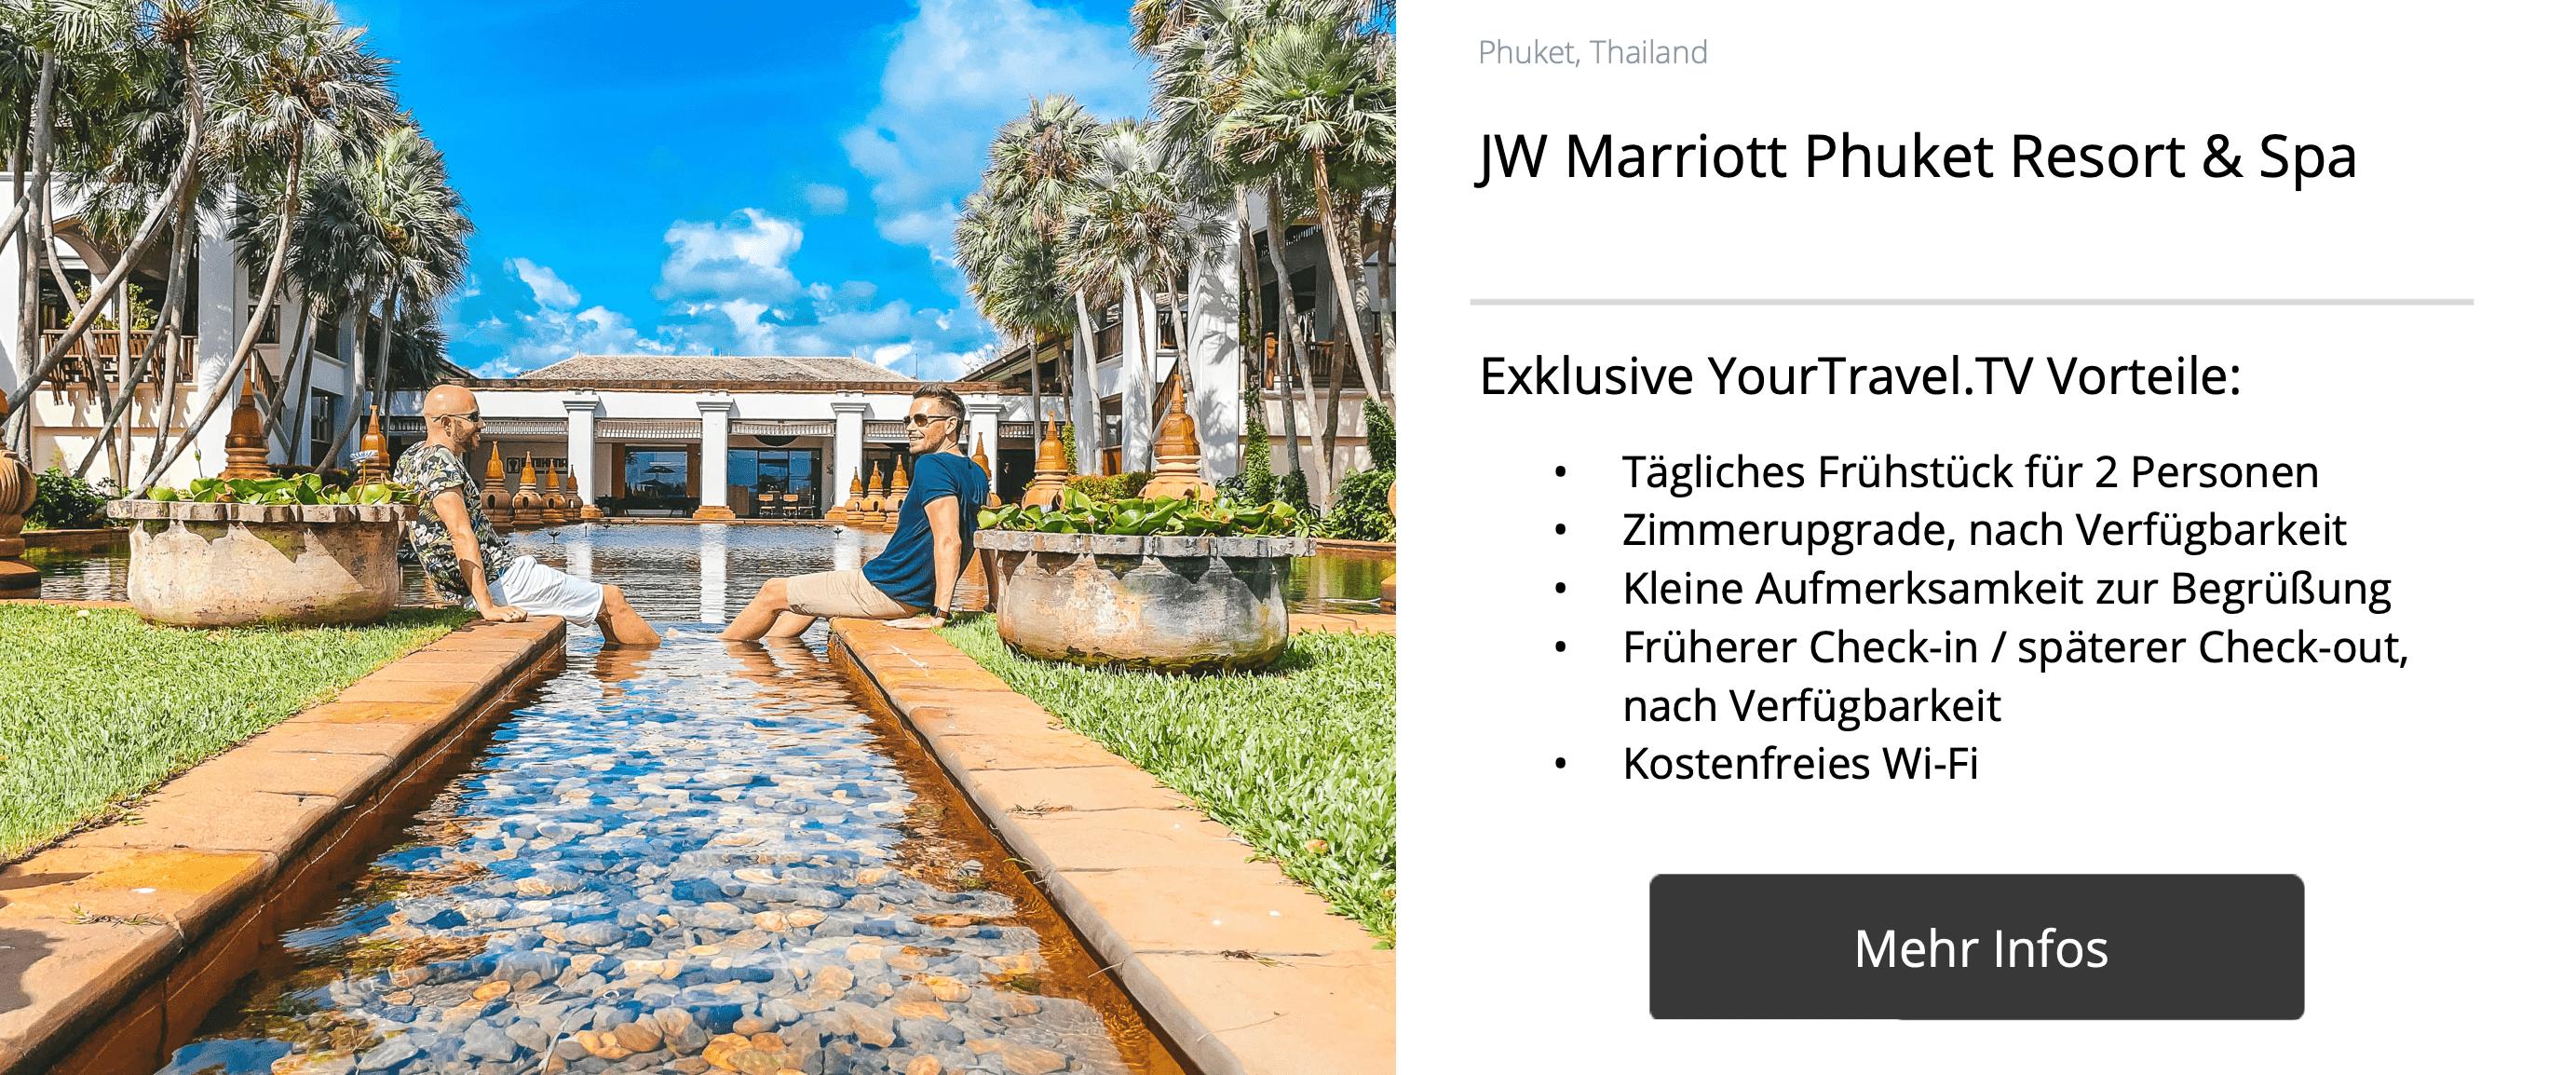 JW Marriott Phuket - YourTravel.TV